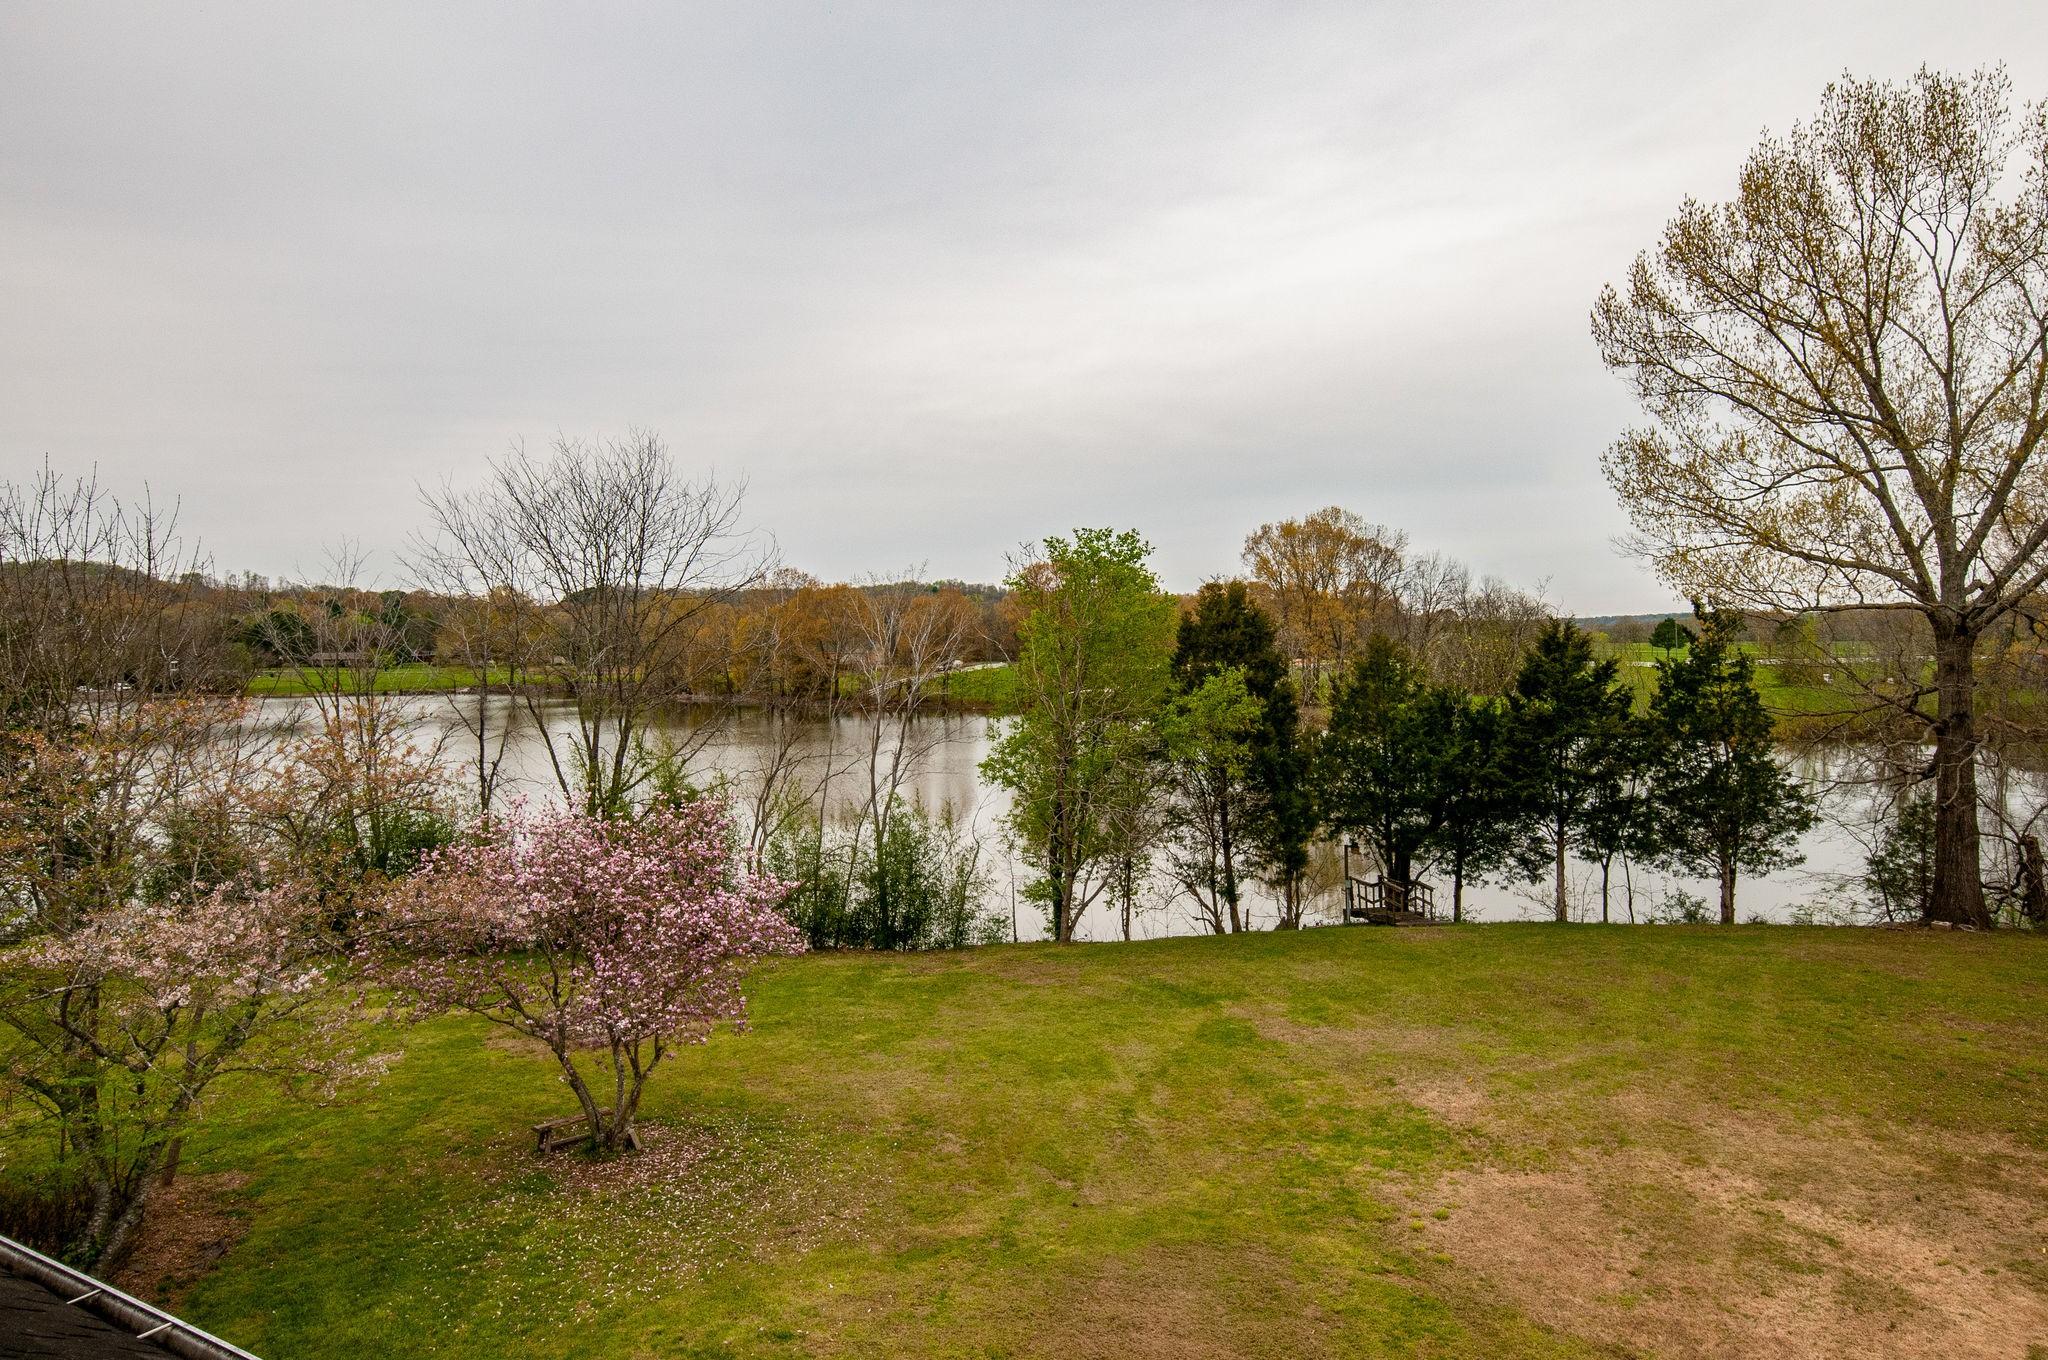 1014 Lakeview Cir, Ashland City, TN 37015 - Ashland City, TN real estate listing